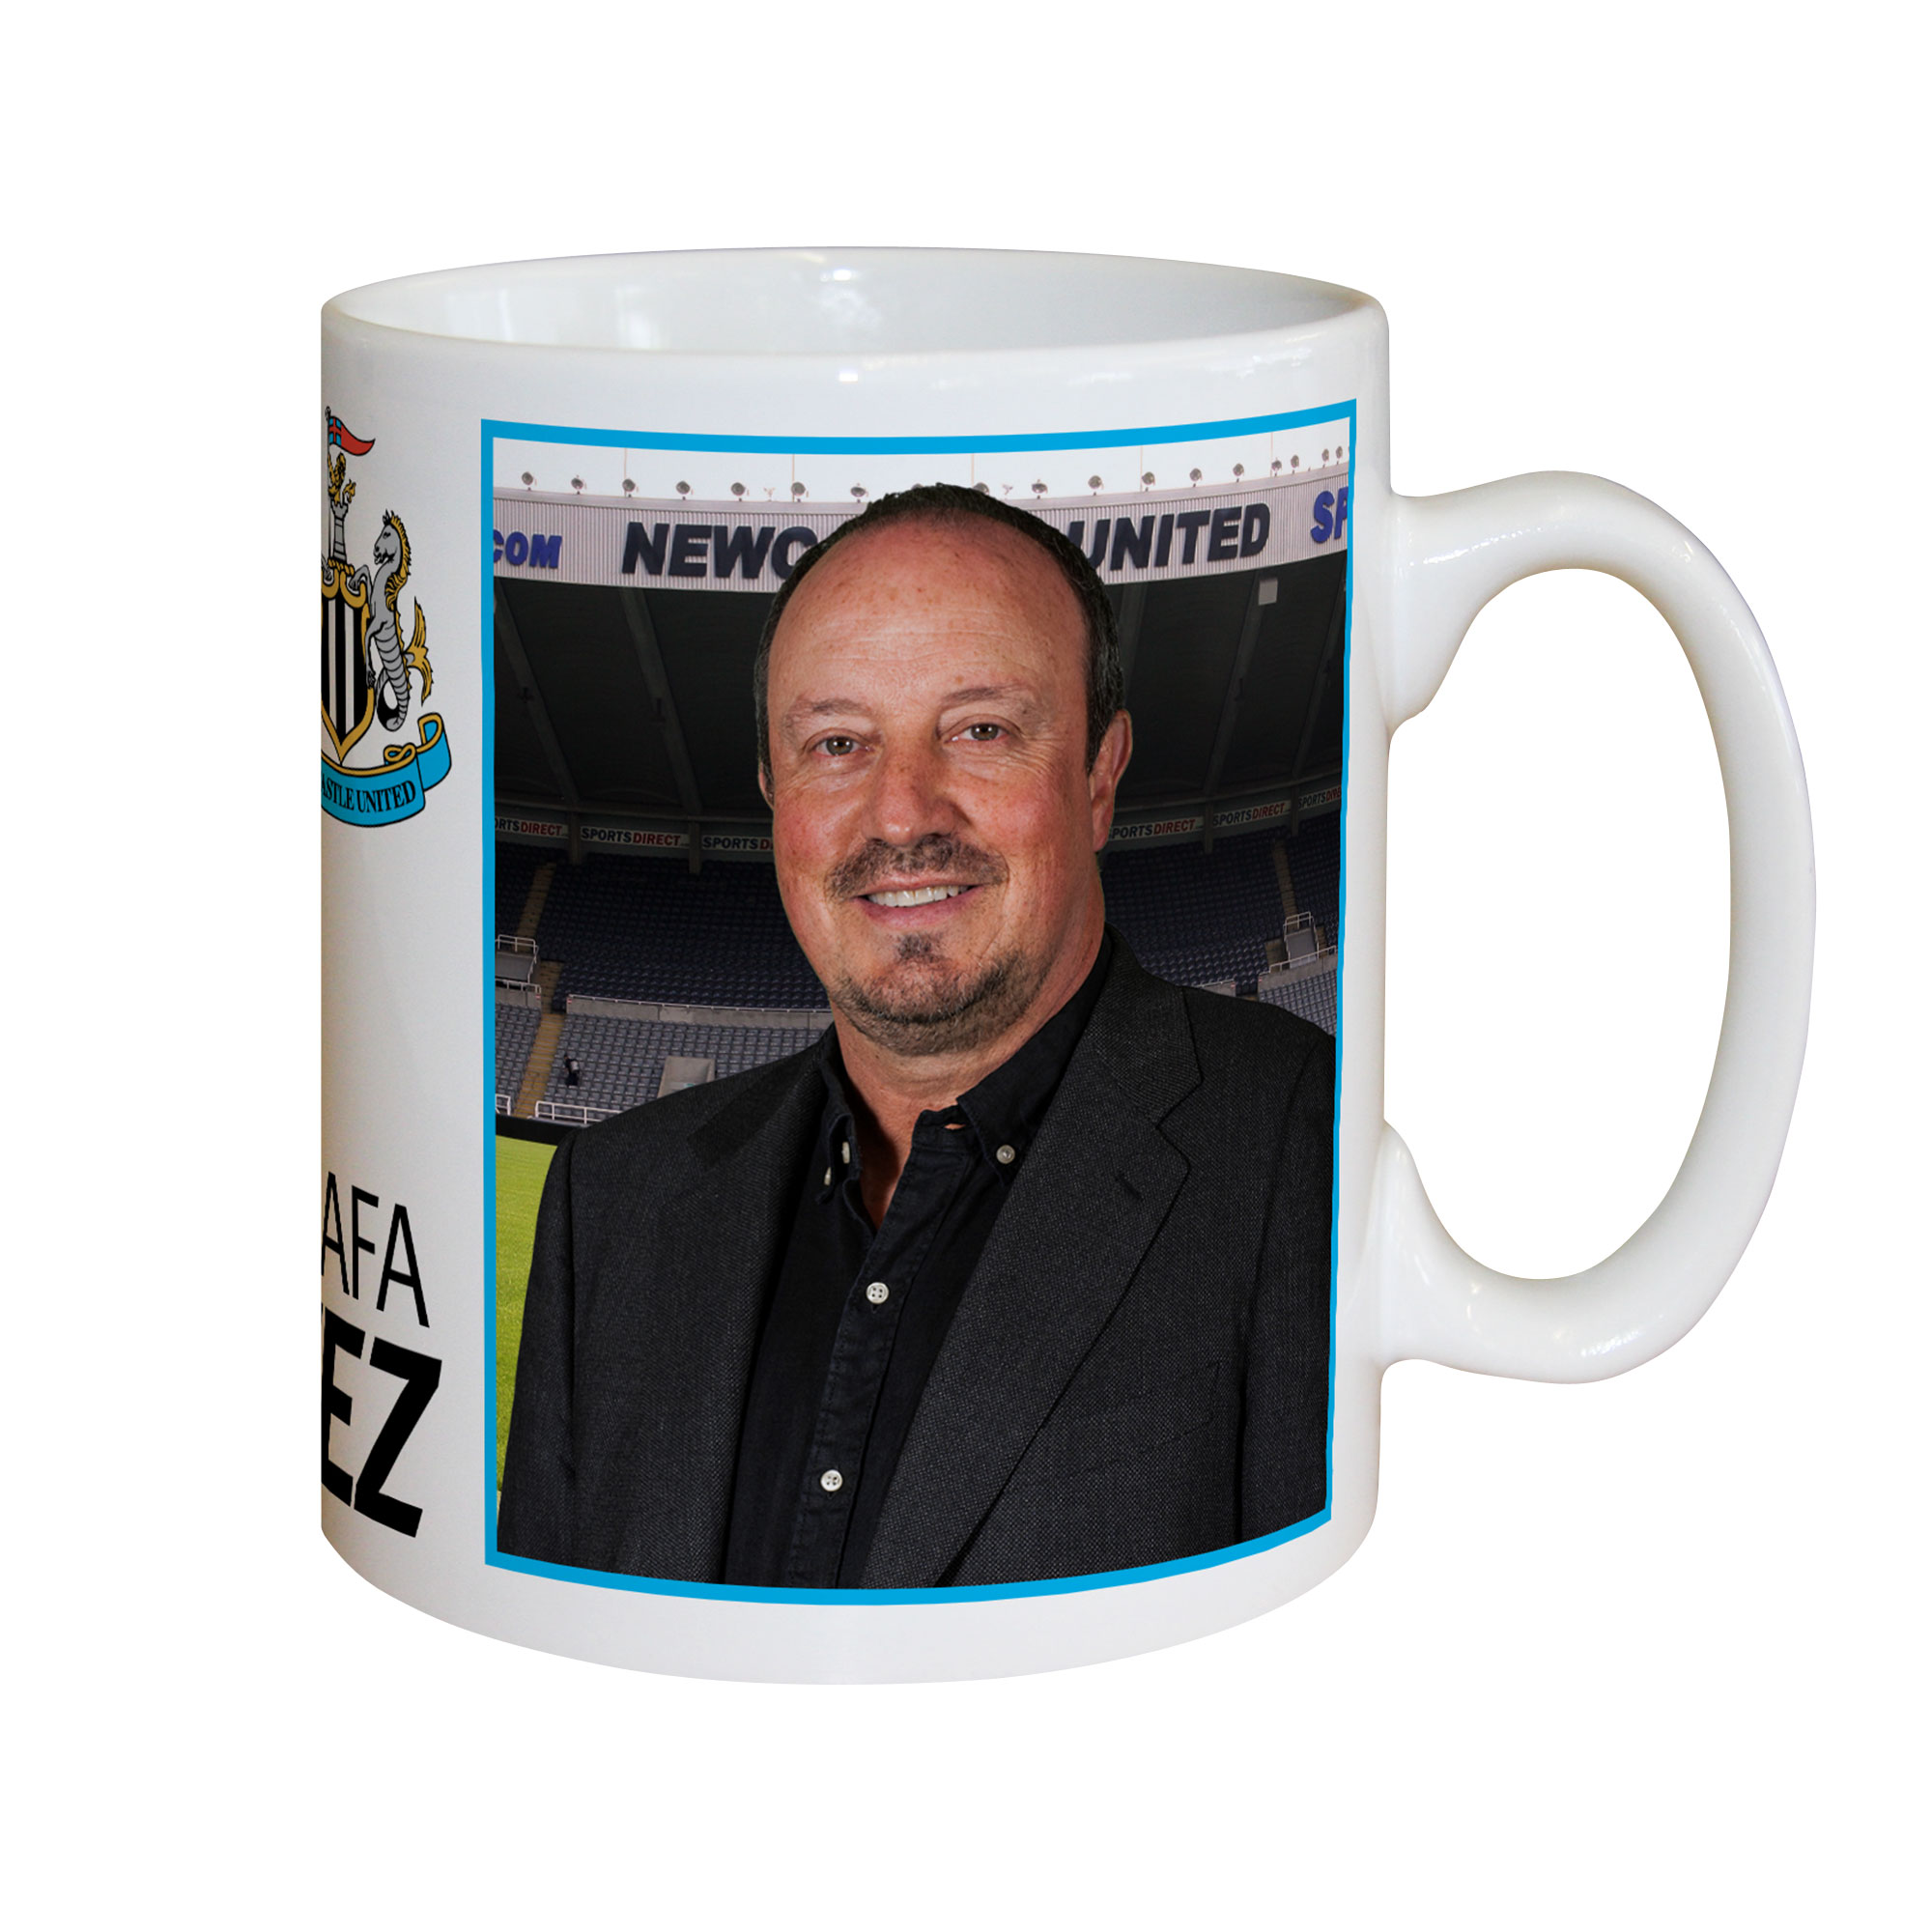 Newcastle United FC Benitez Autograph Mug